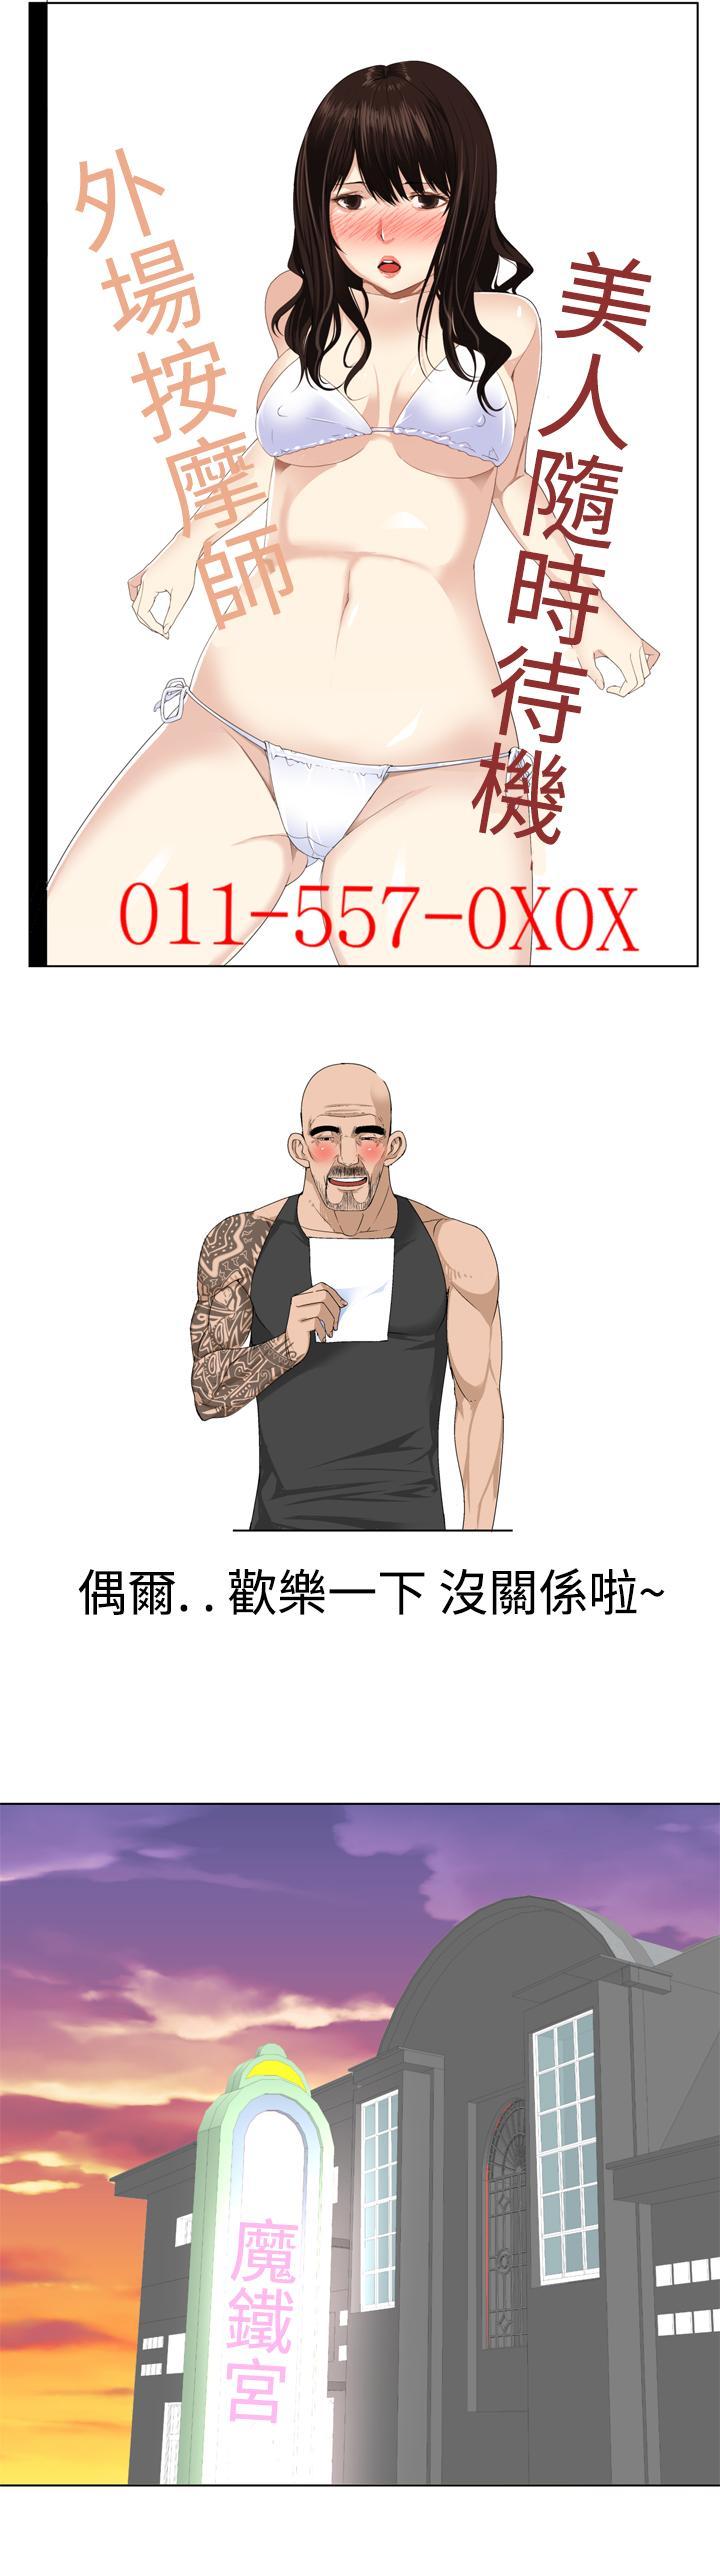 [SOSO] Franken Jo 为爱而生 法兰克赵 Ch.1~19 [Chinese]中文 390